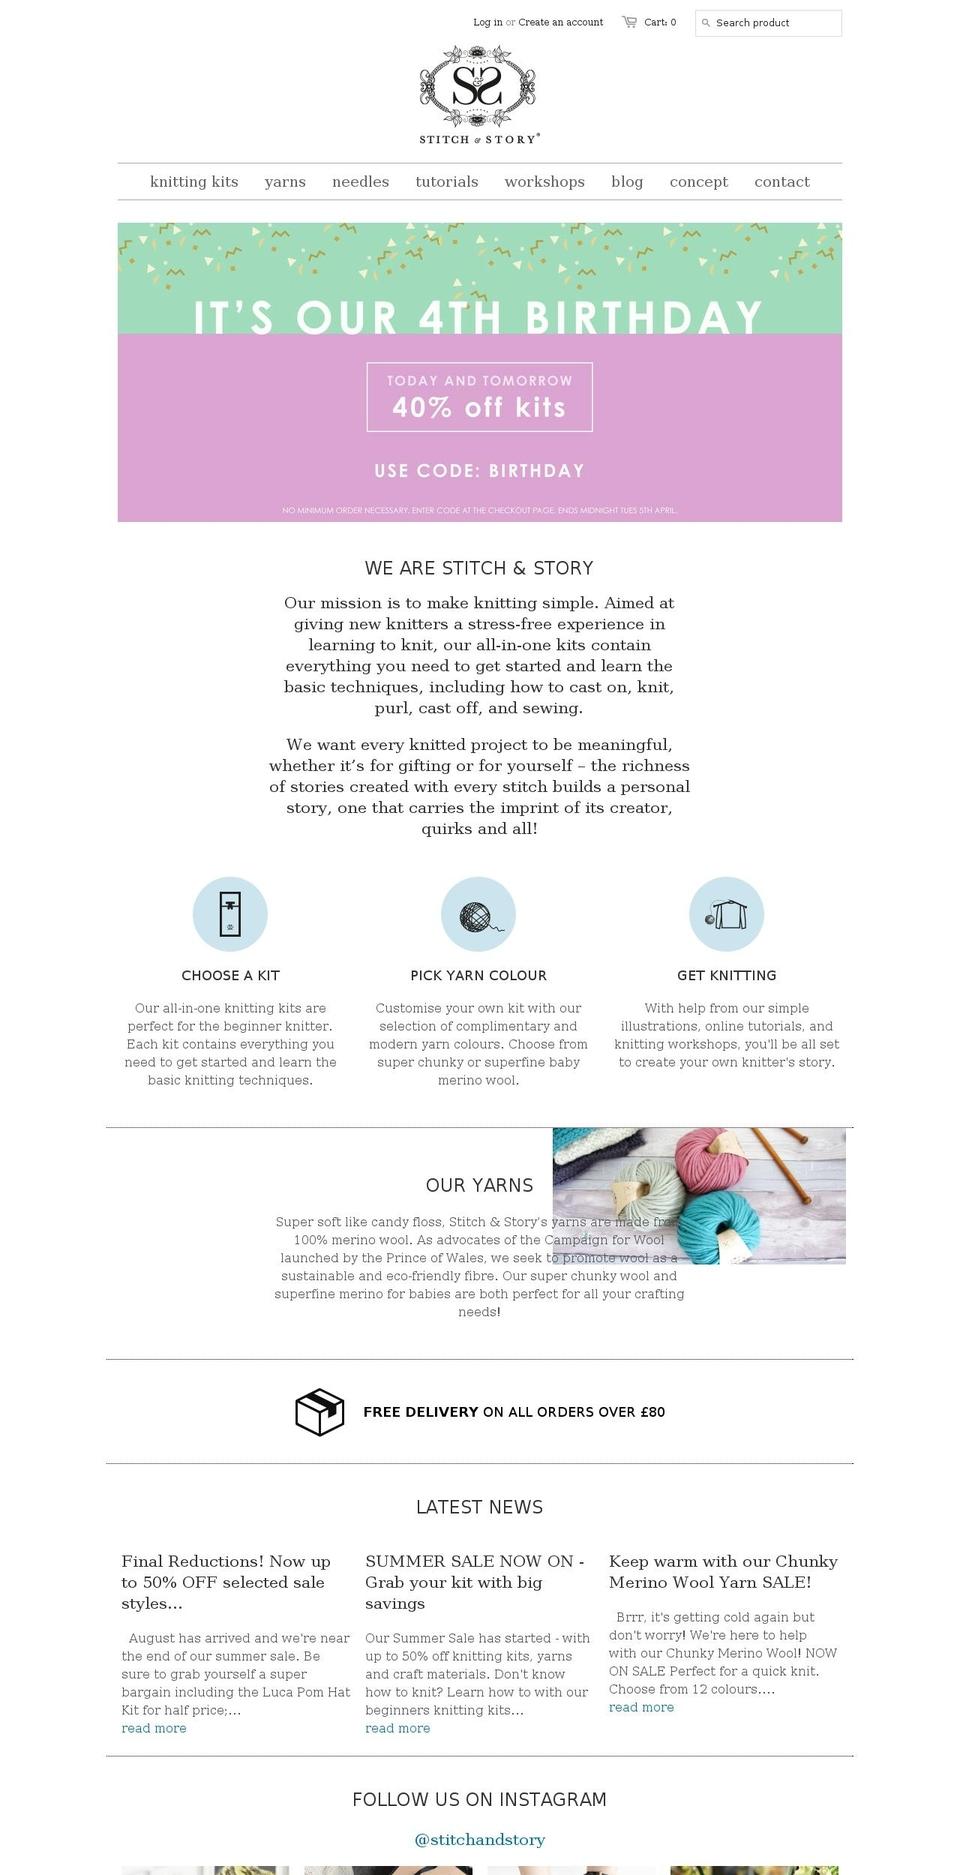 Studio-Ikigai Shopify theme websites examples, download